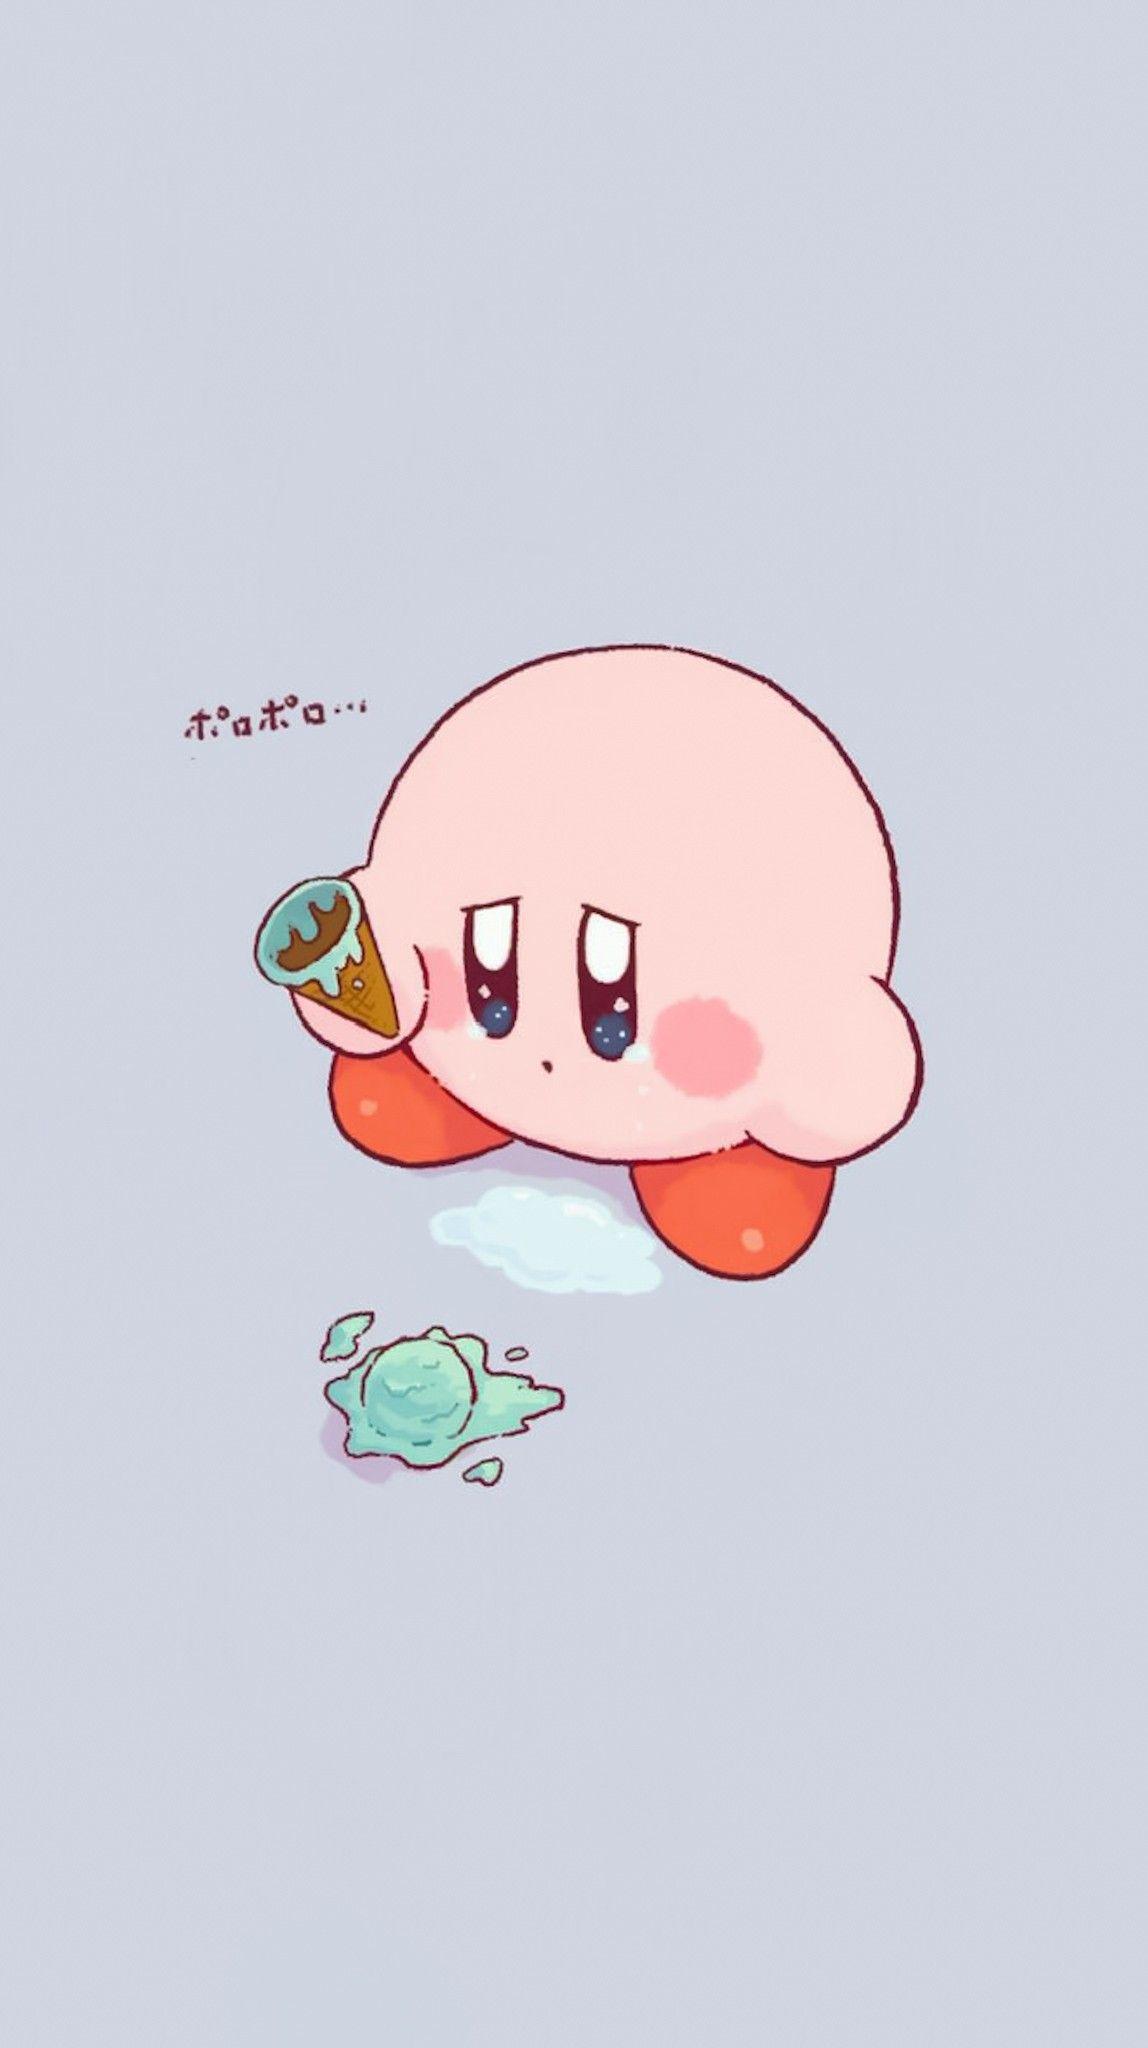 Pin By Gorka Reparaz Arenaza On Kirby Bg Kirby Character Kirby Memes Kirby Art